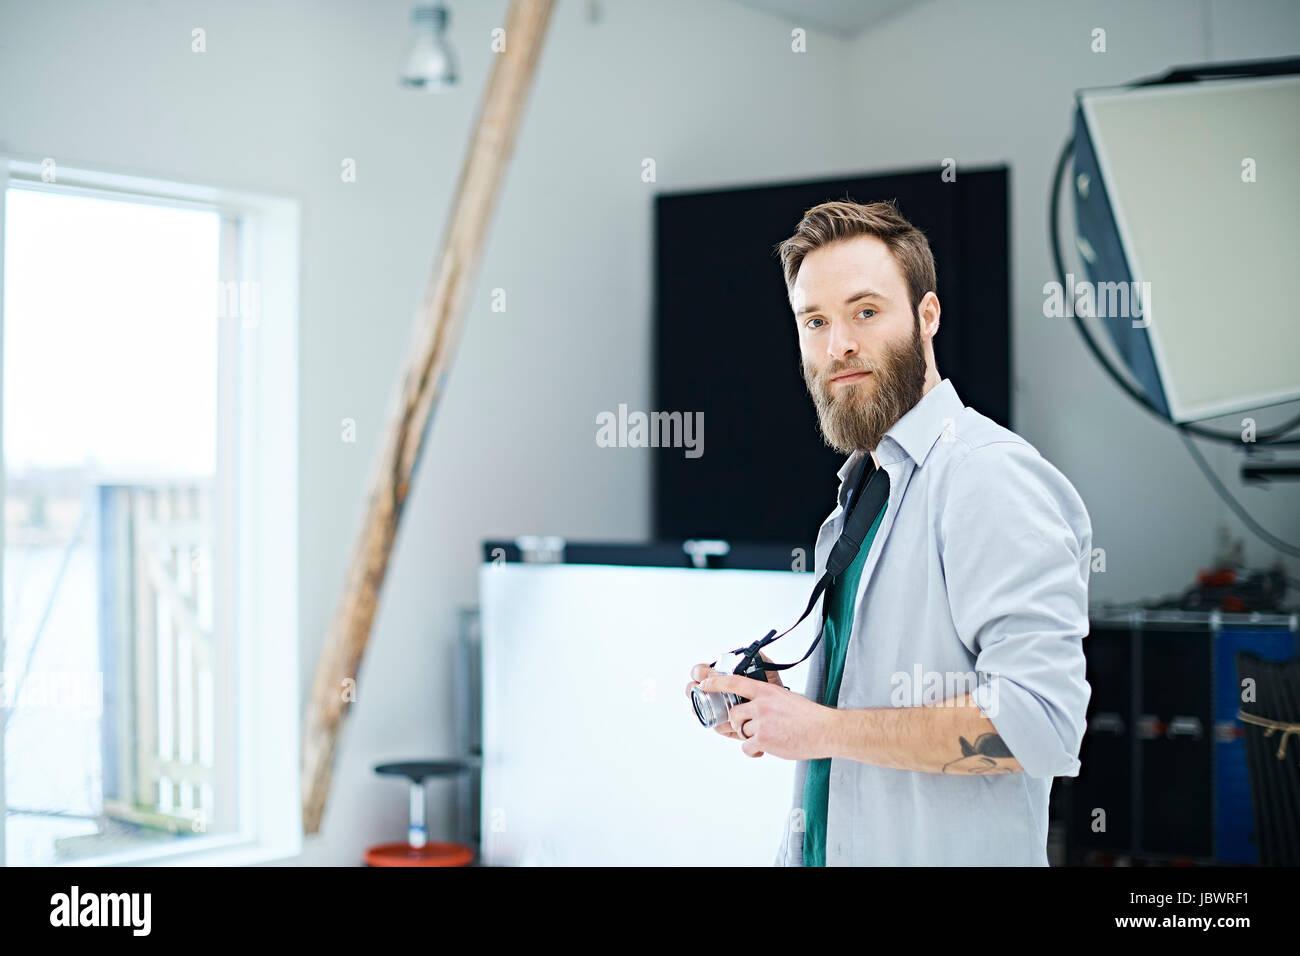 Portrait of male designer with digital camera in design studio - Stock Image